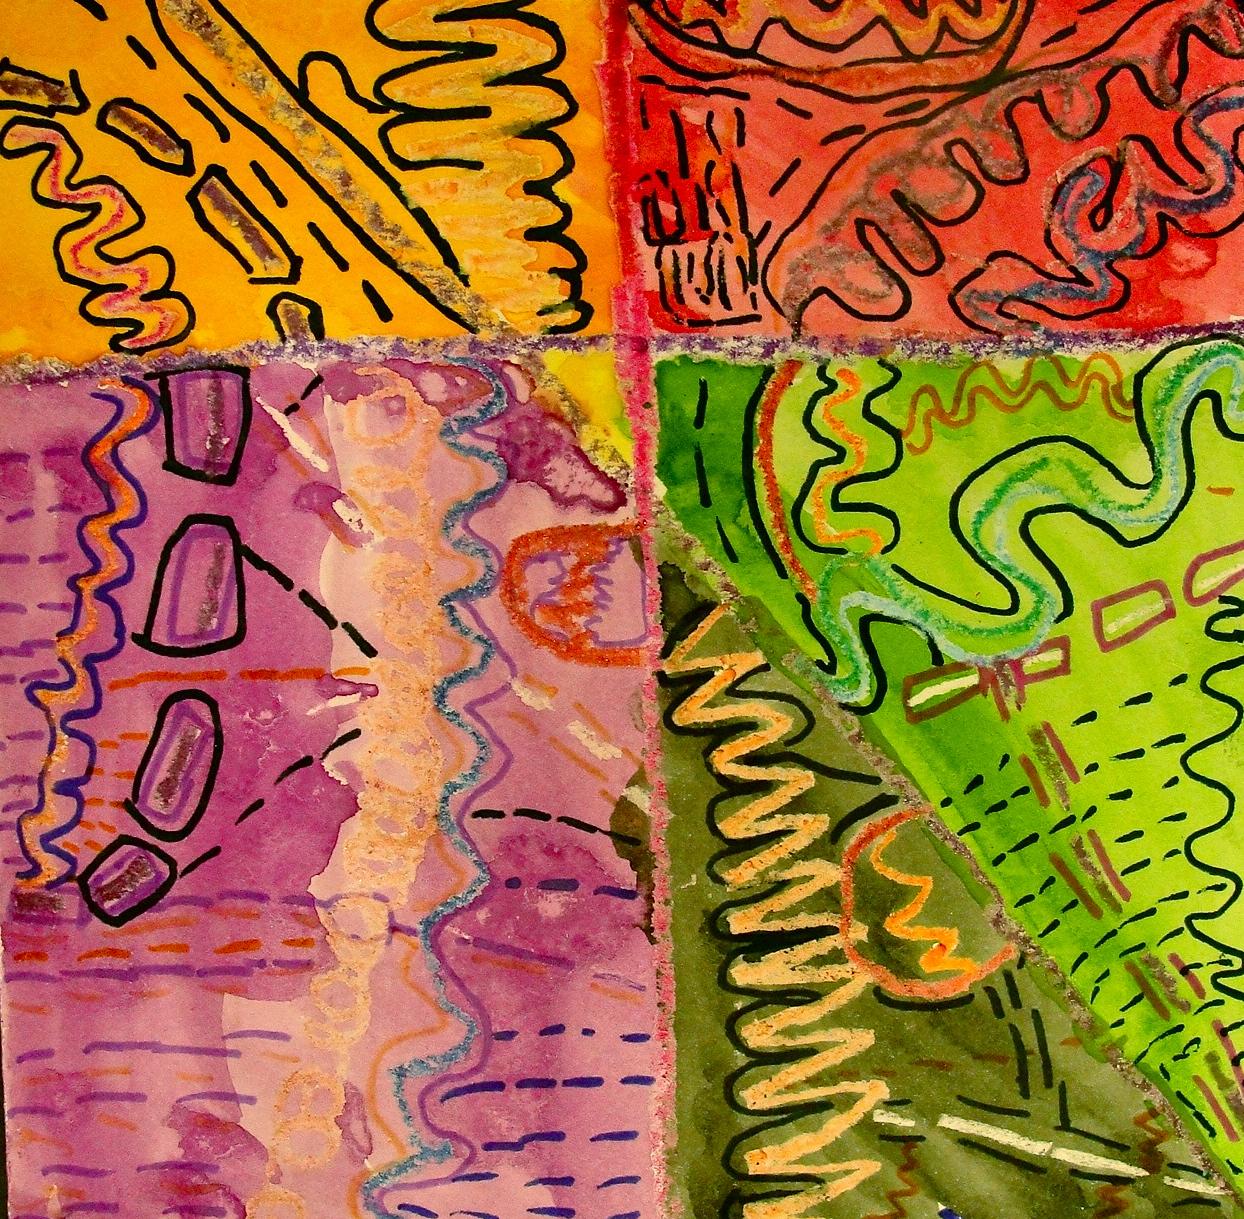 Line Art Grade 1 : Da vinci s wings st grade line paintings square art